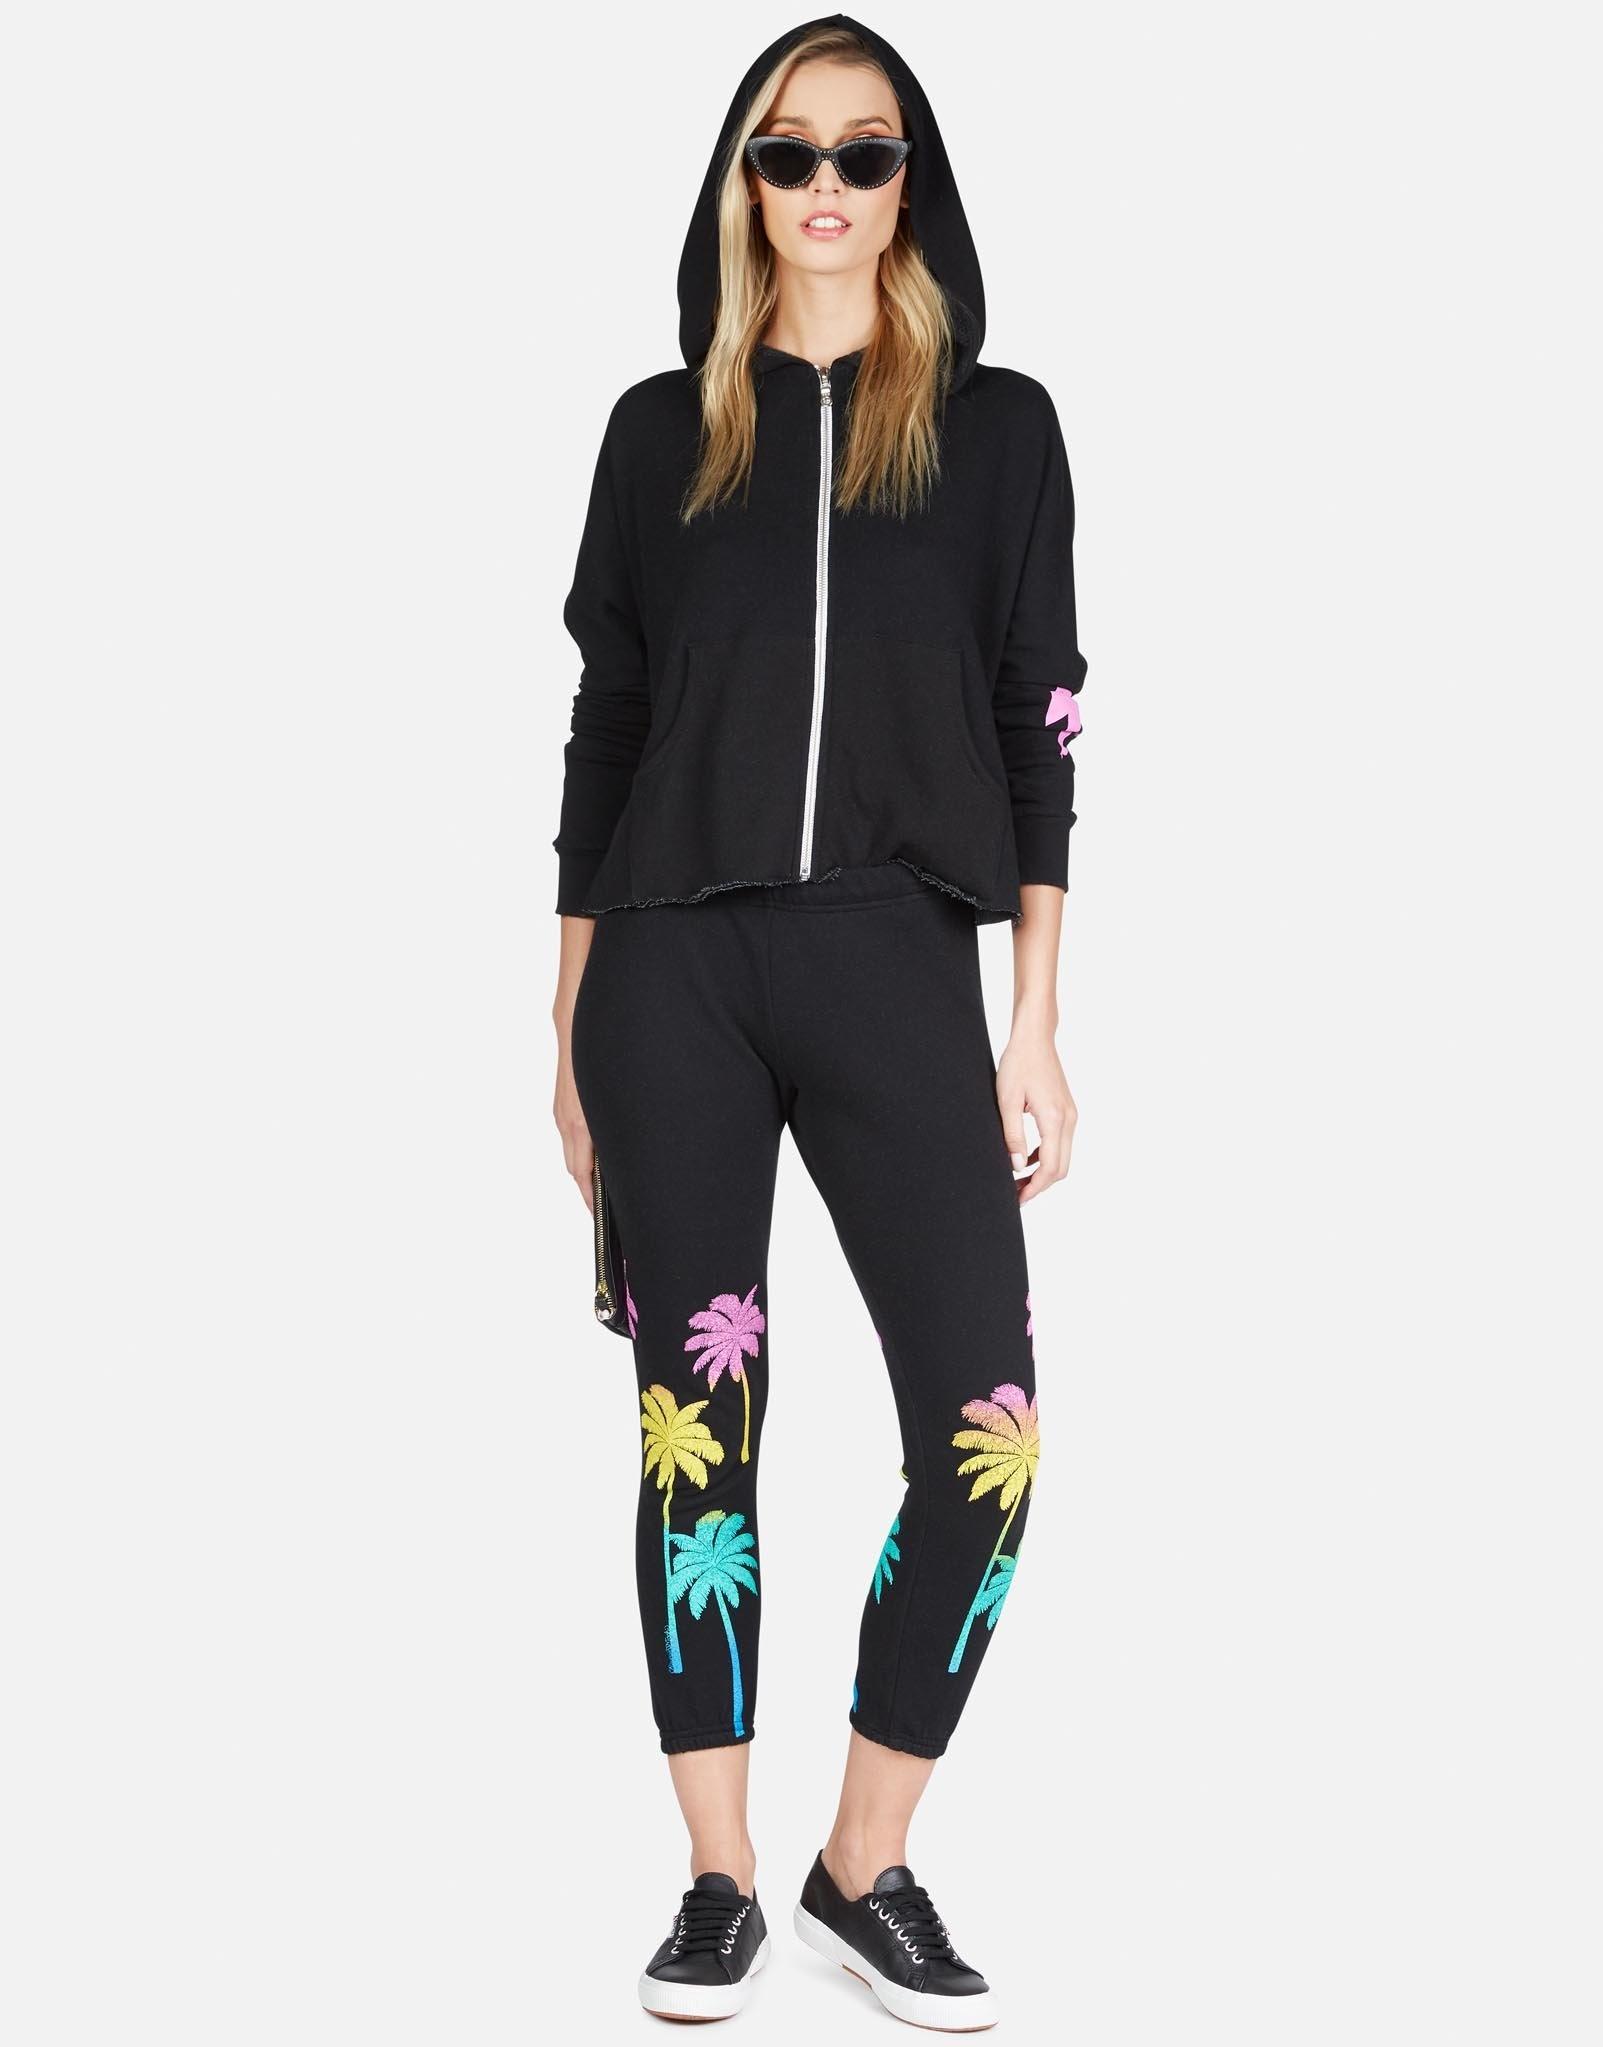 Lauren Moshi Alana Crop Sweatpant - Neon Palm Trees